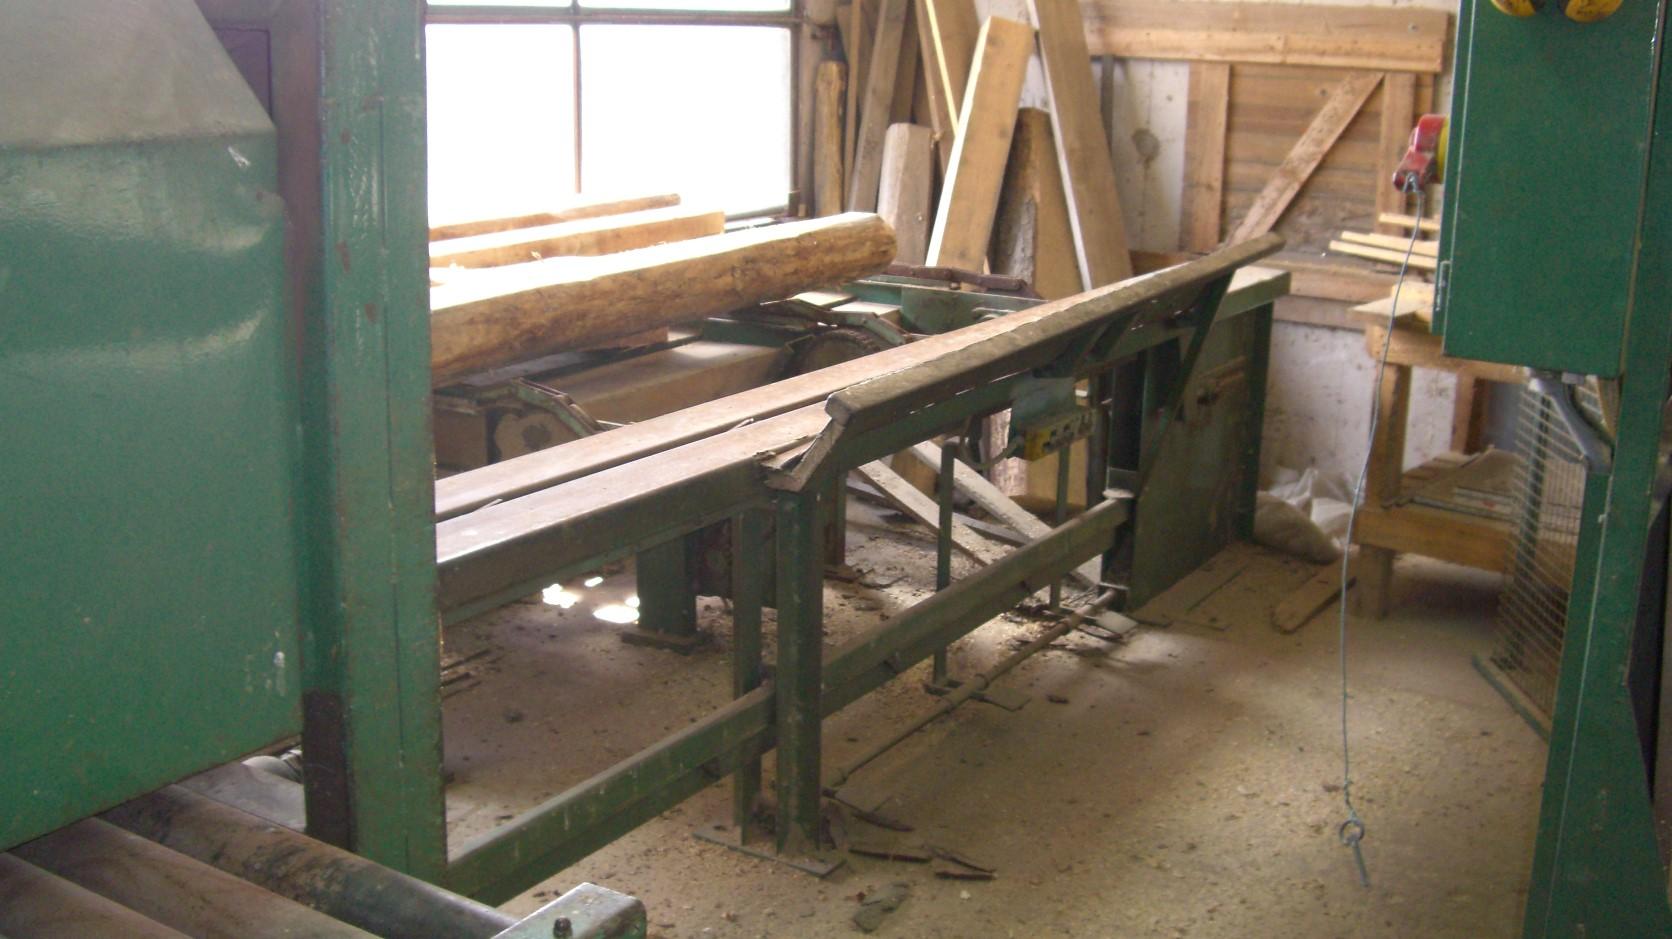 Sierra de madera schumacher sch35 3 maquinas de segunda - Sierra de mano para madera ...